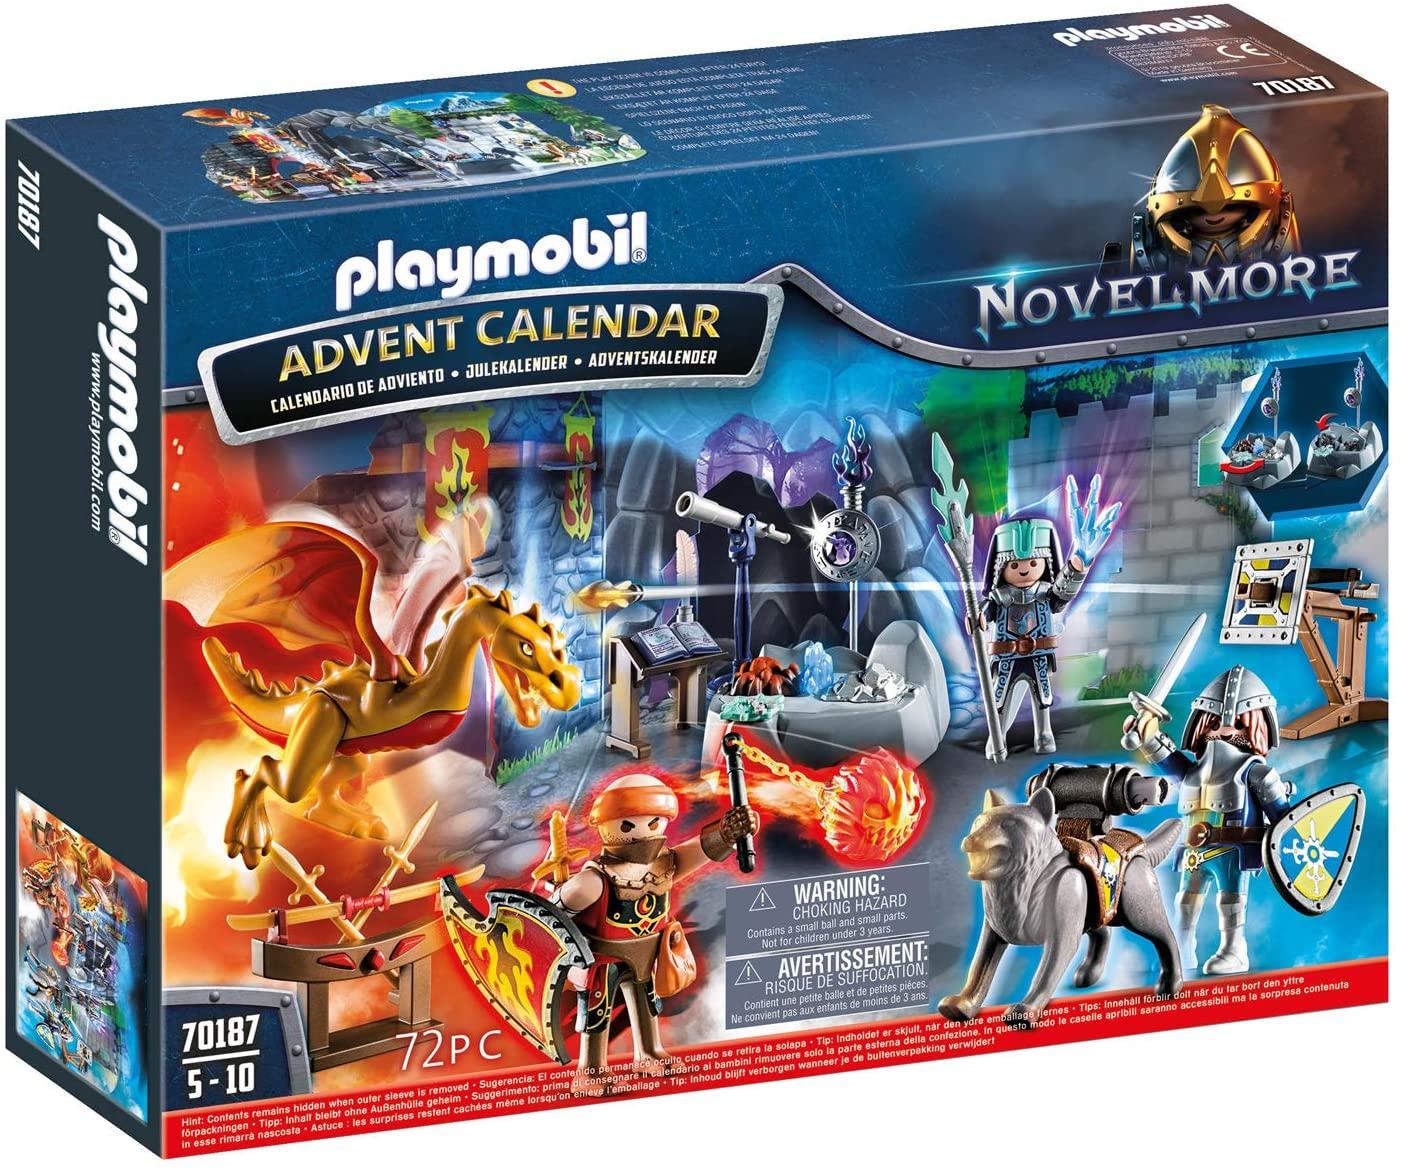 Playmobil Knights of Novelmore Advent Calendar 2019